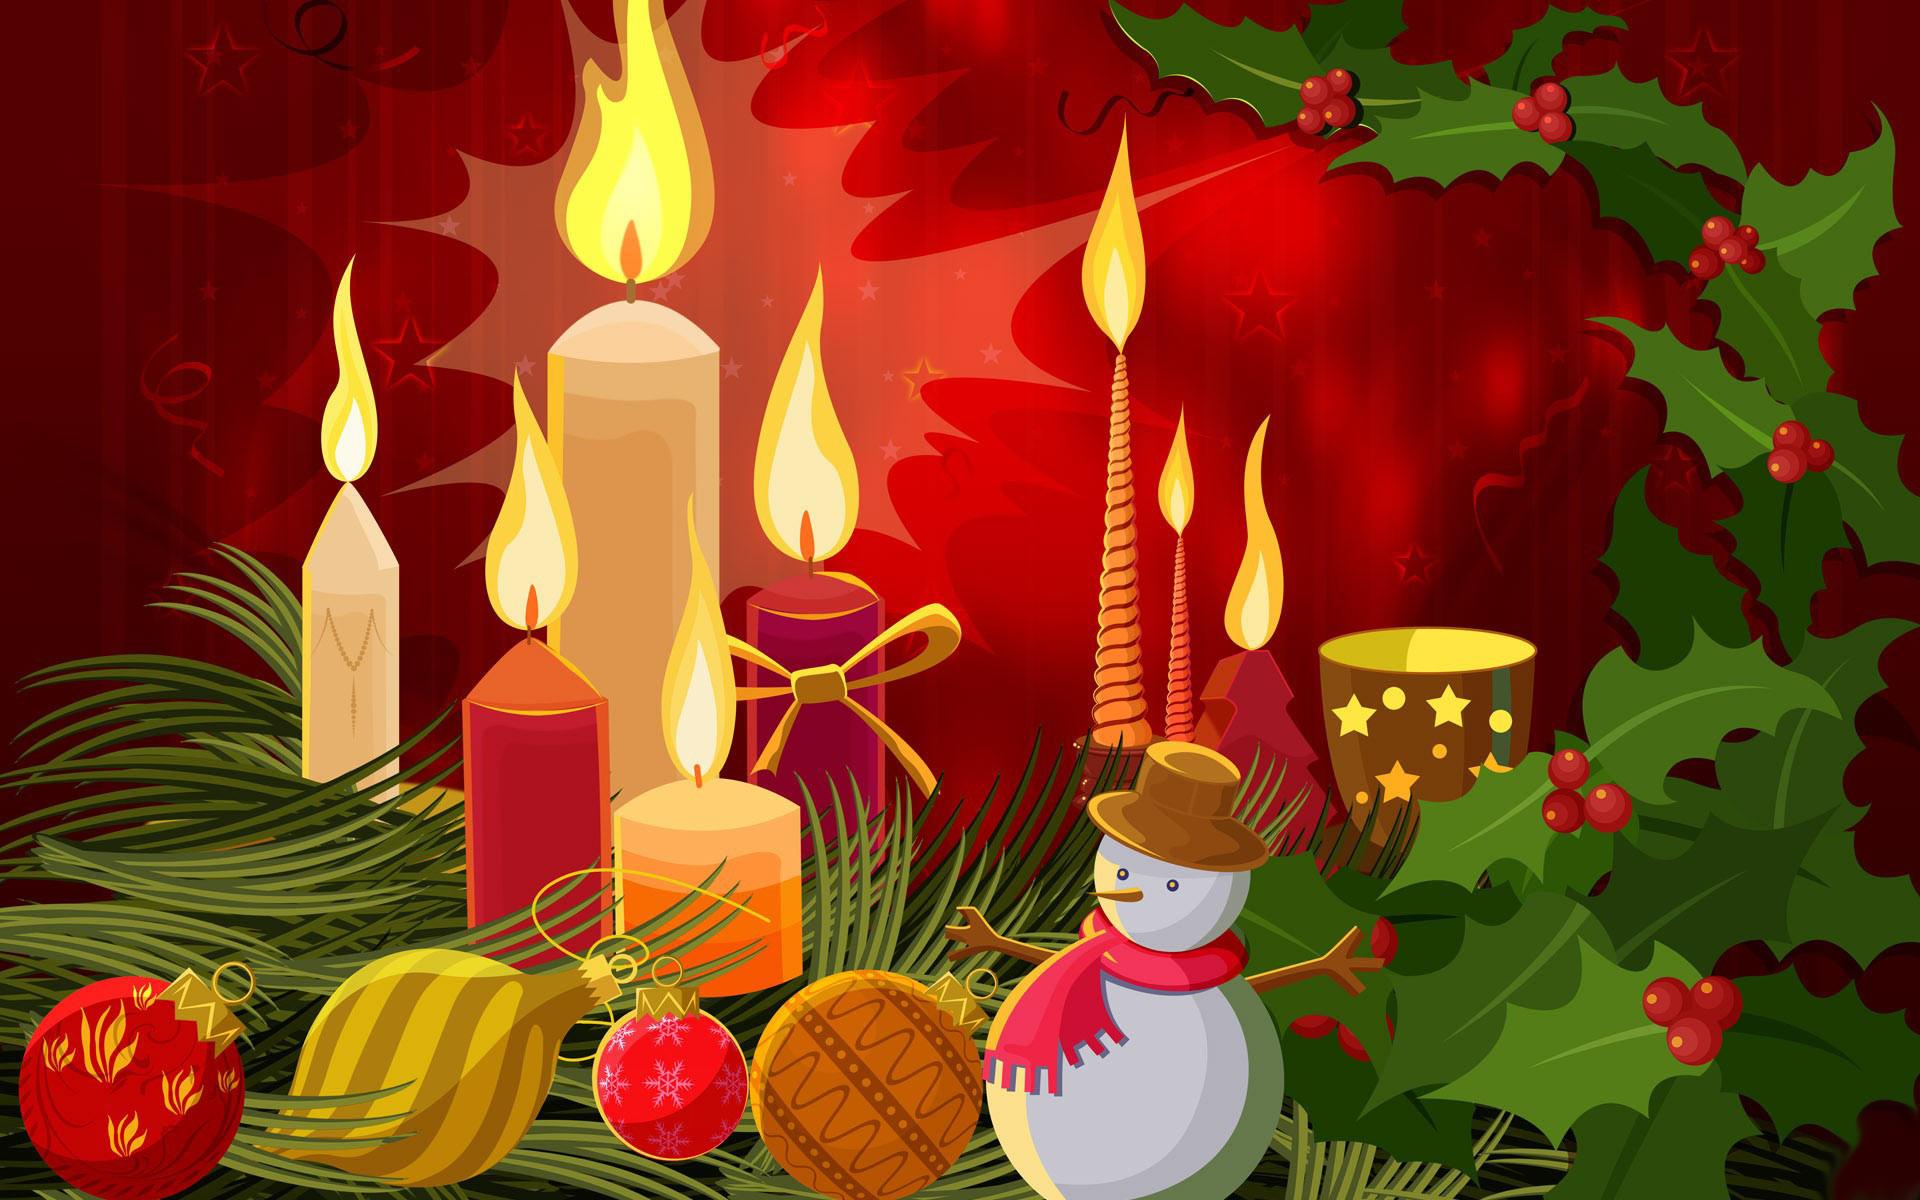 Merry Christmas background Desktop Wallpaper | High Quality Wallpapers .